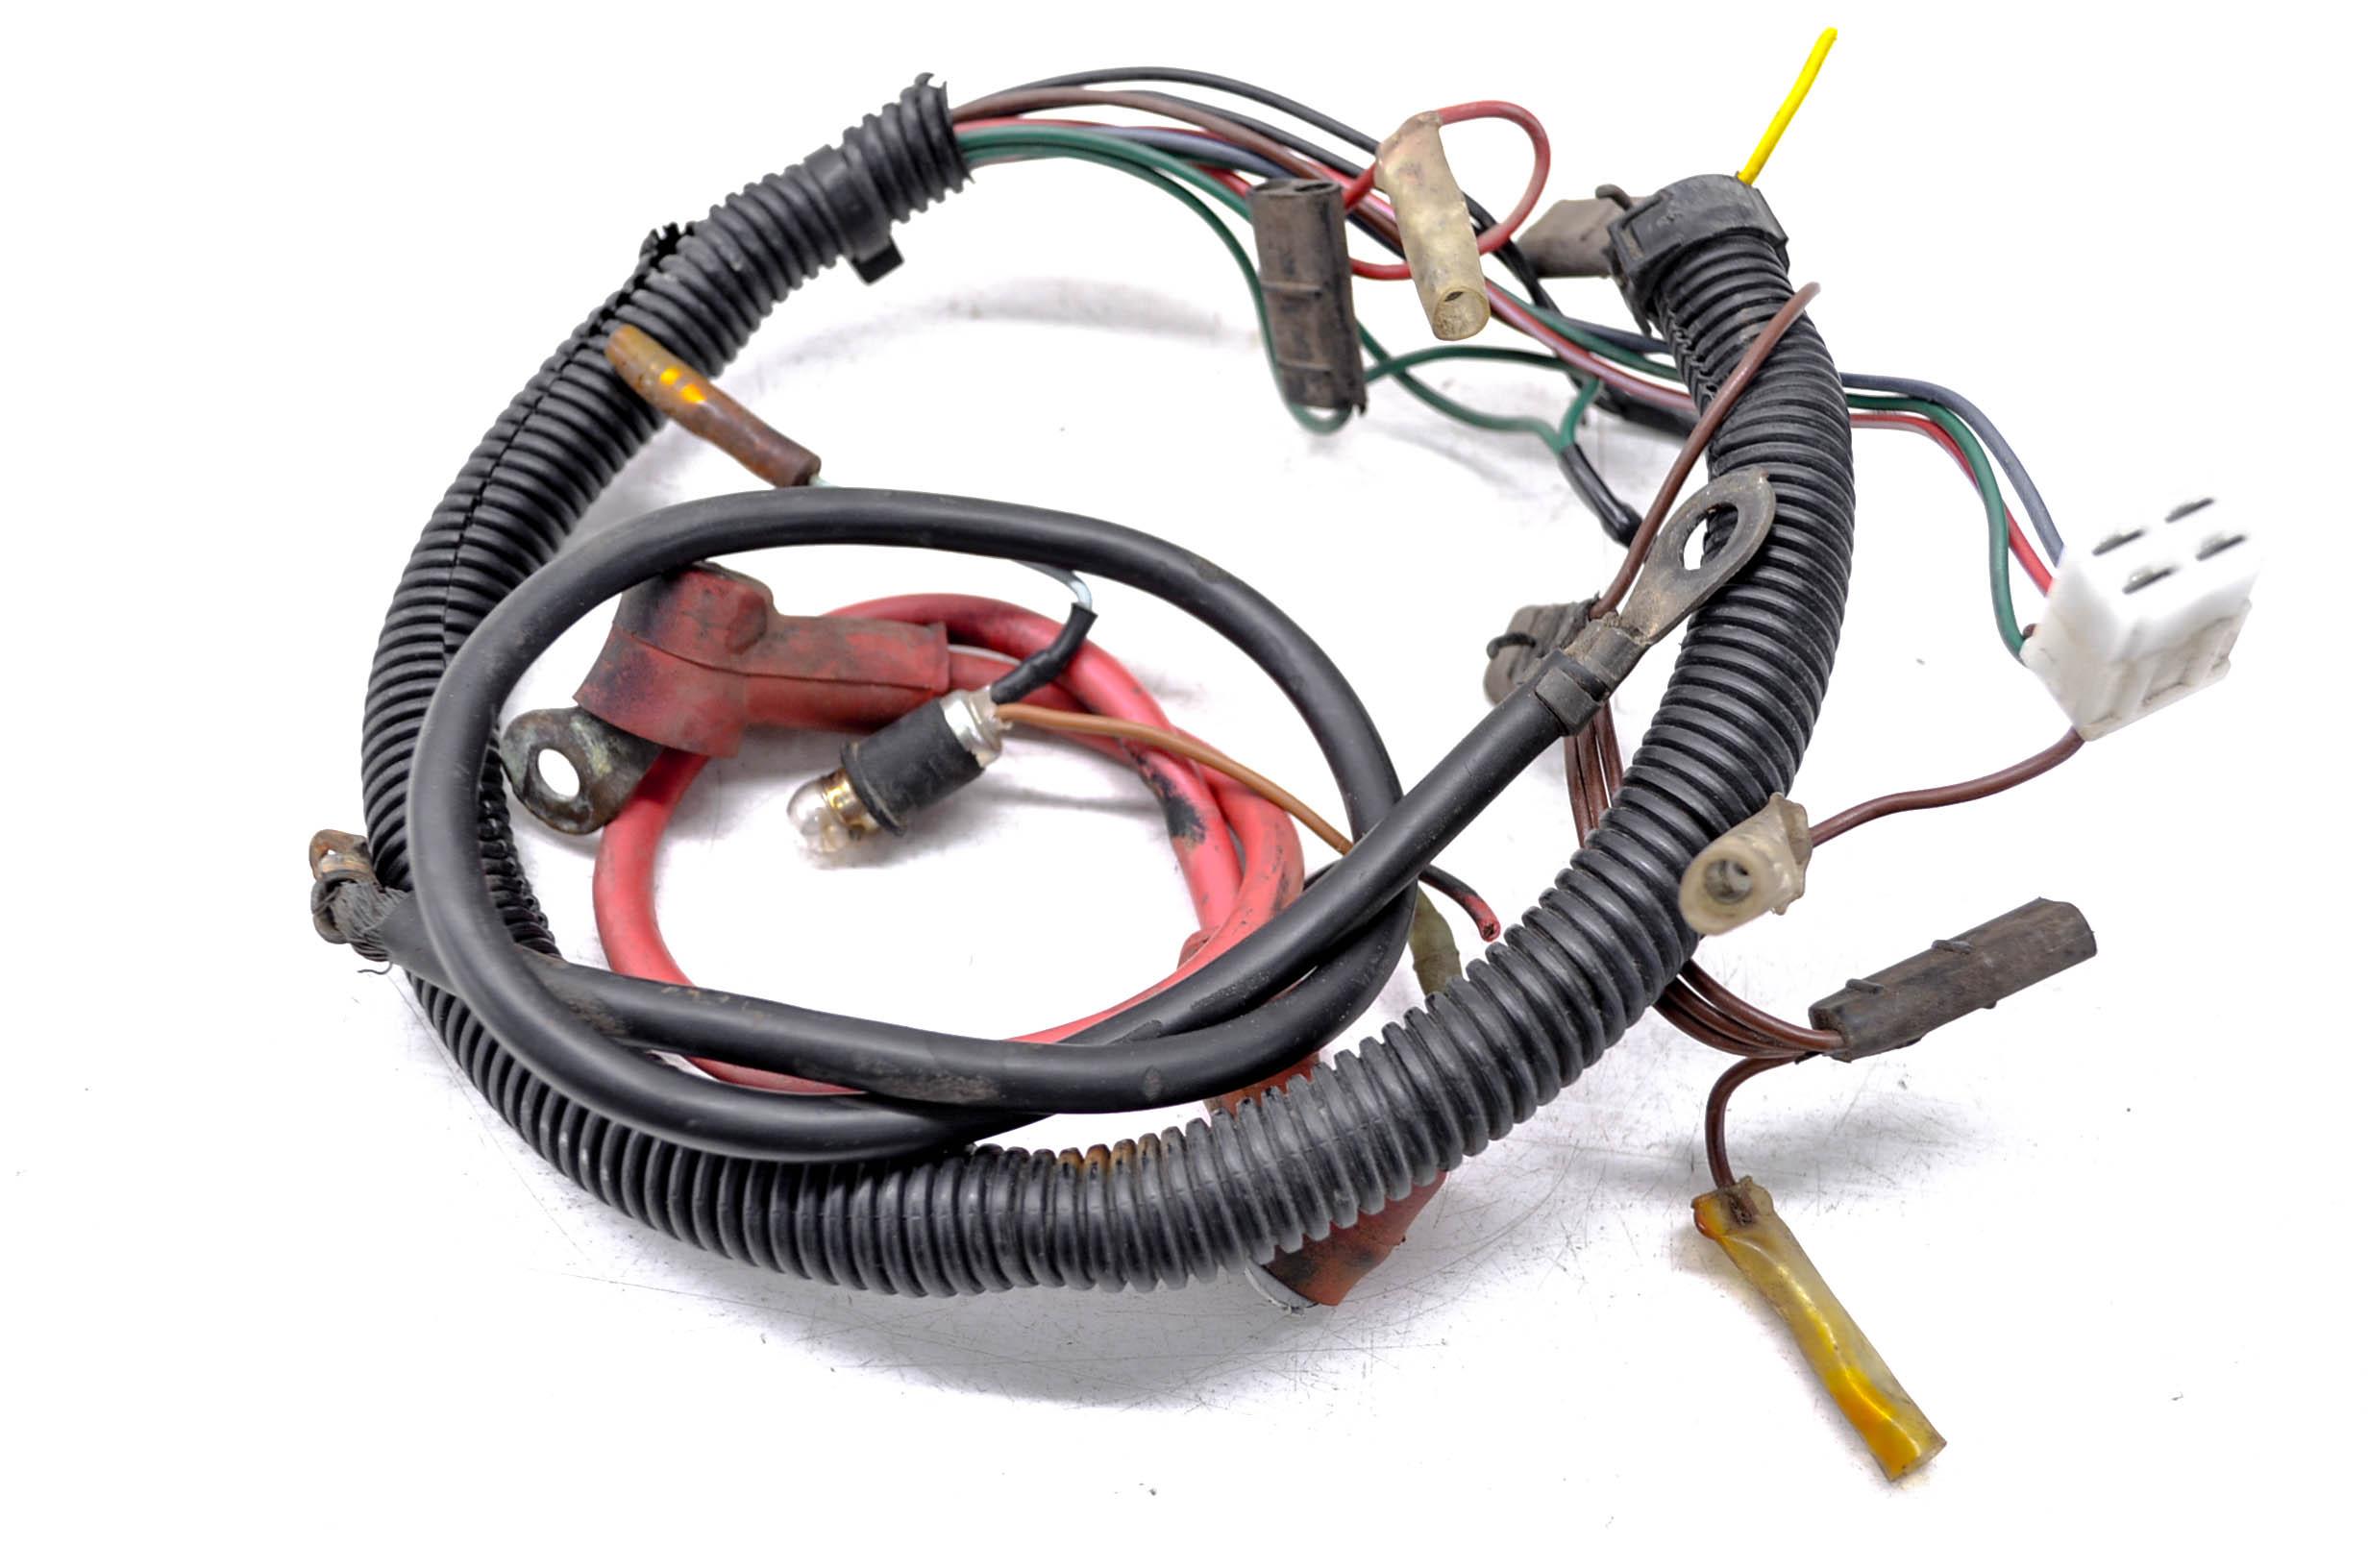 87 Polaris Trail Boss 250 2x4 Wire Harness Electrical Wiring Ebay 250r